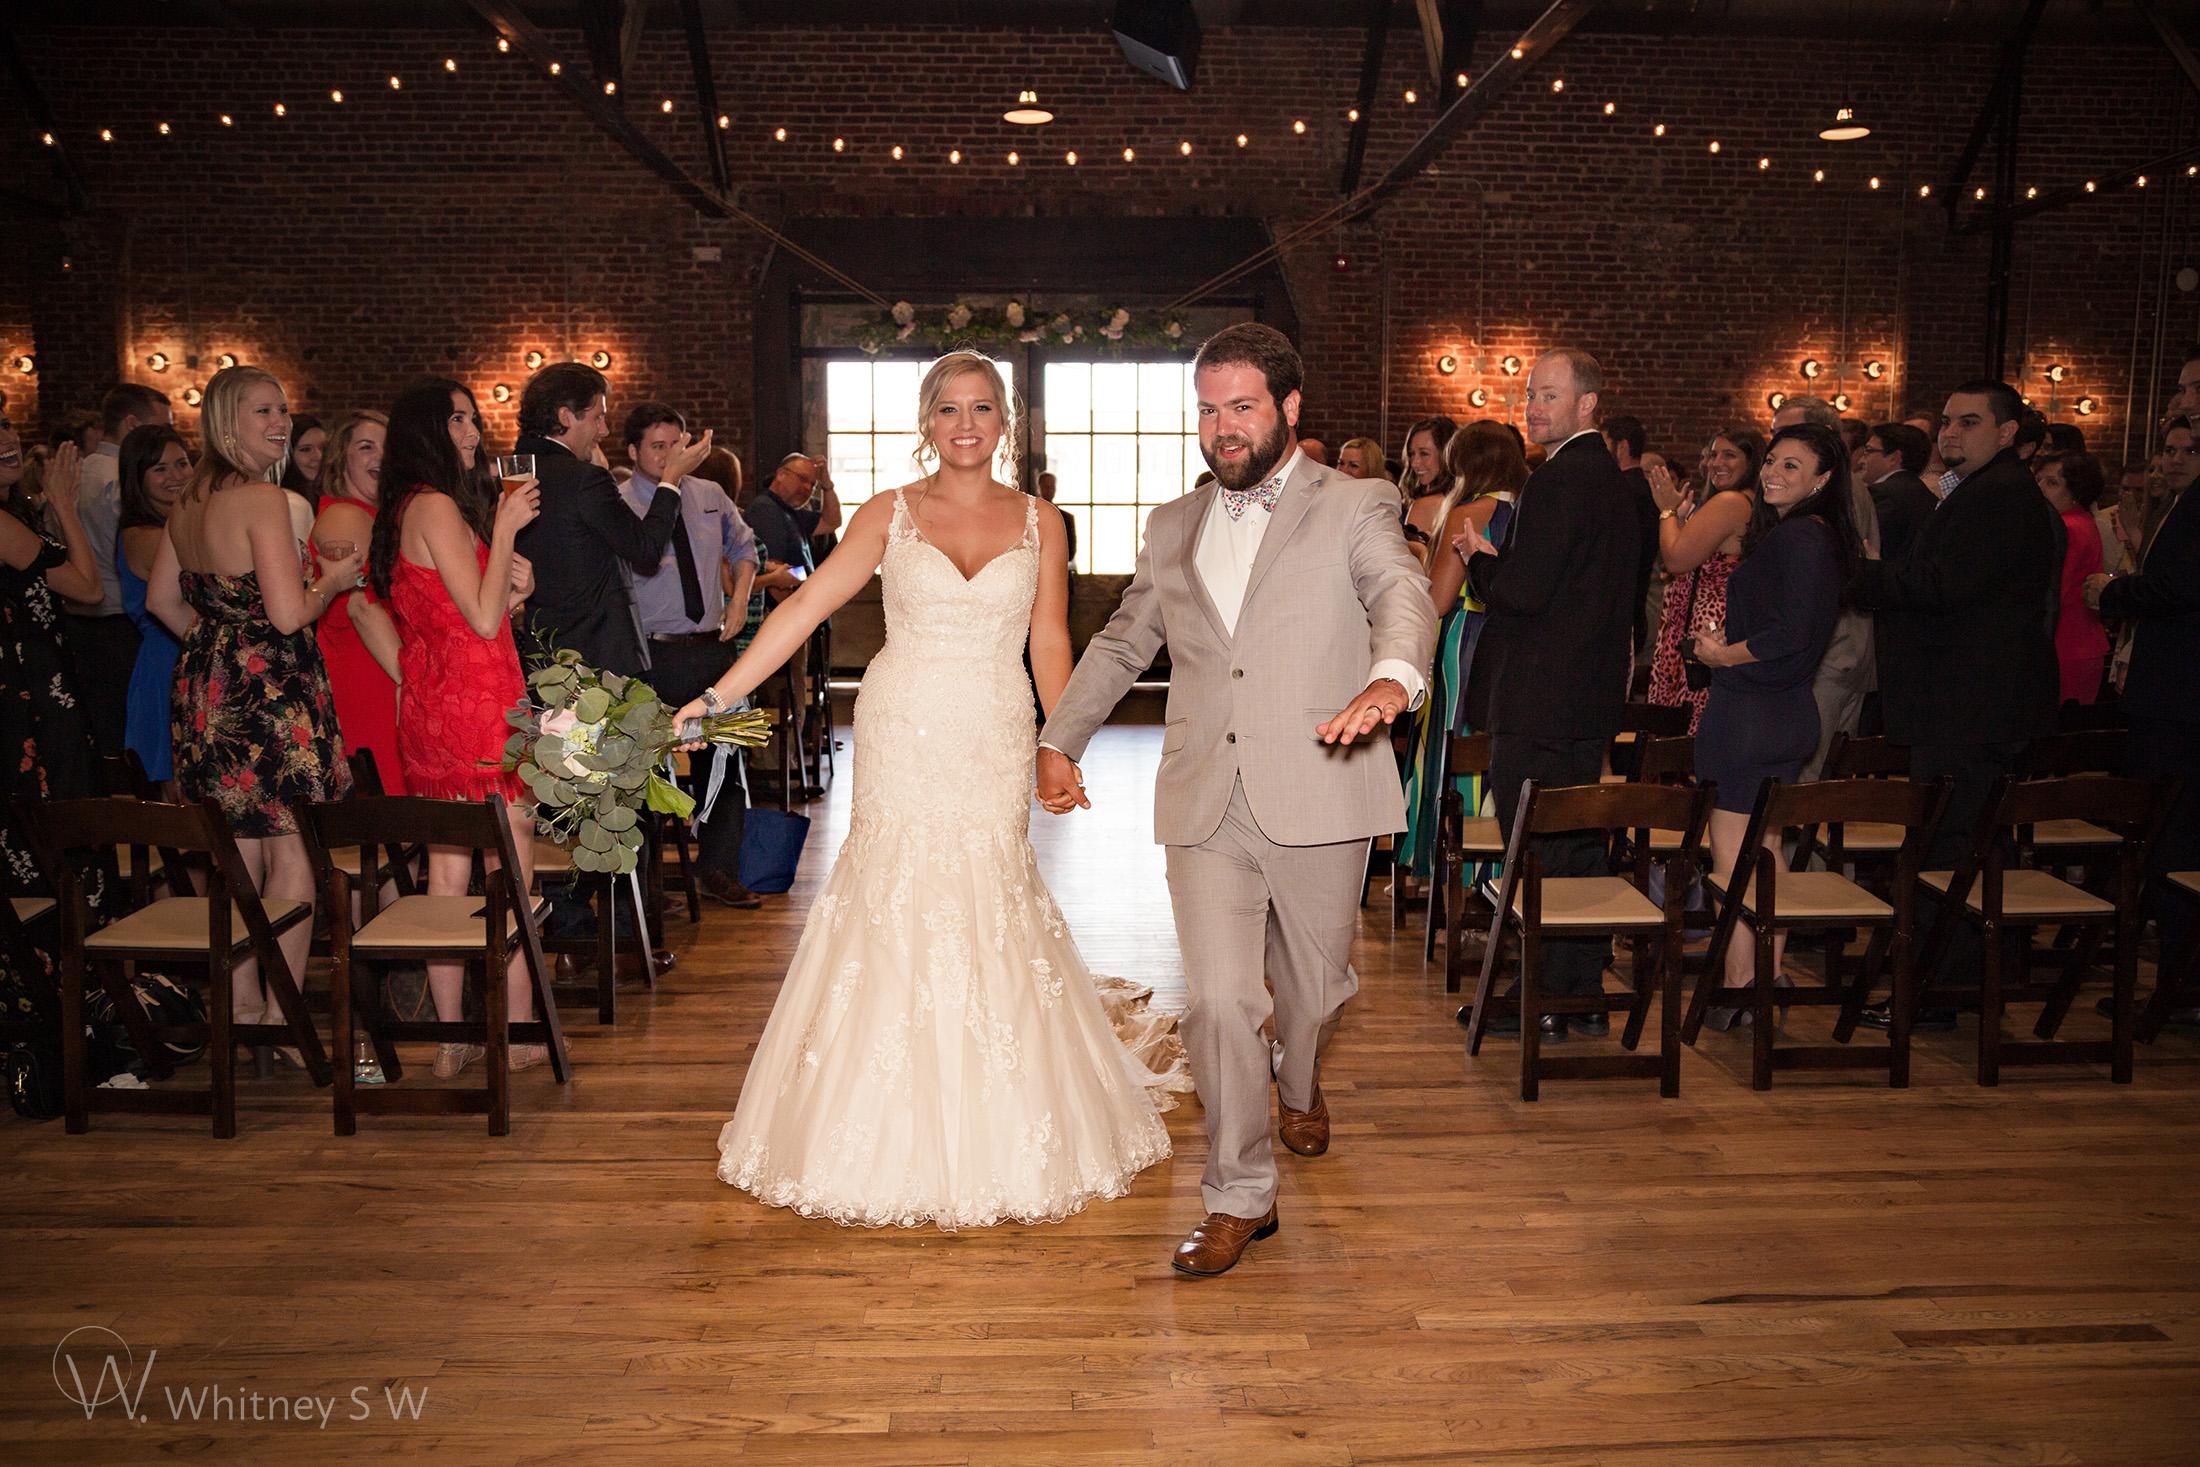 Morgan & Kaivon Wedding - Photography by Whitney S Williams whitneysw (2).jpg